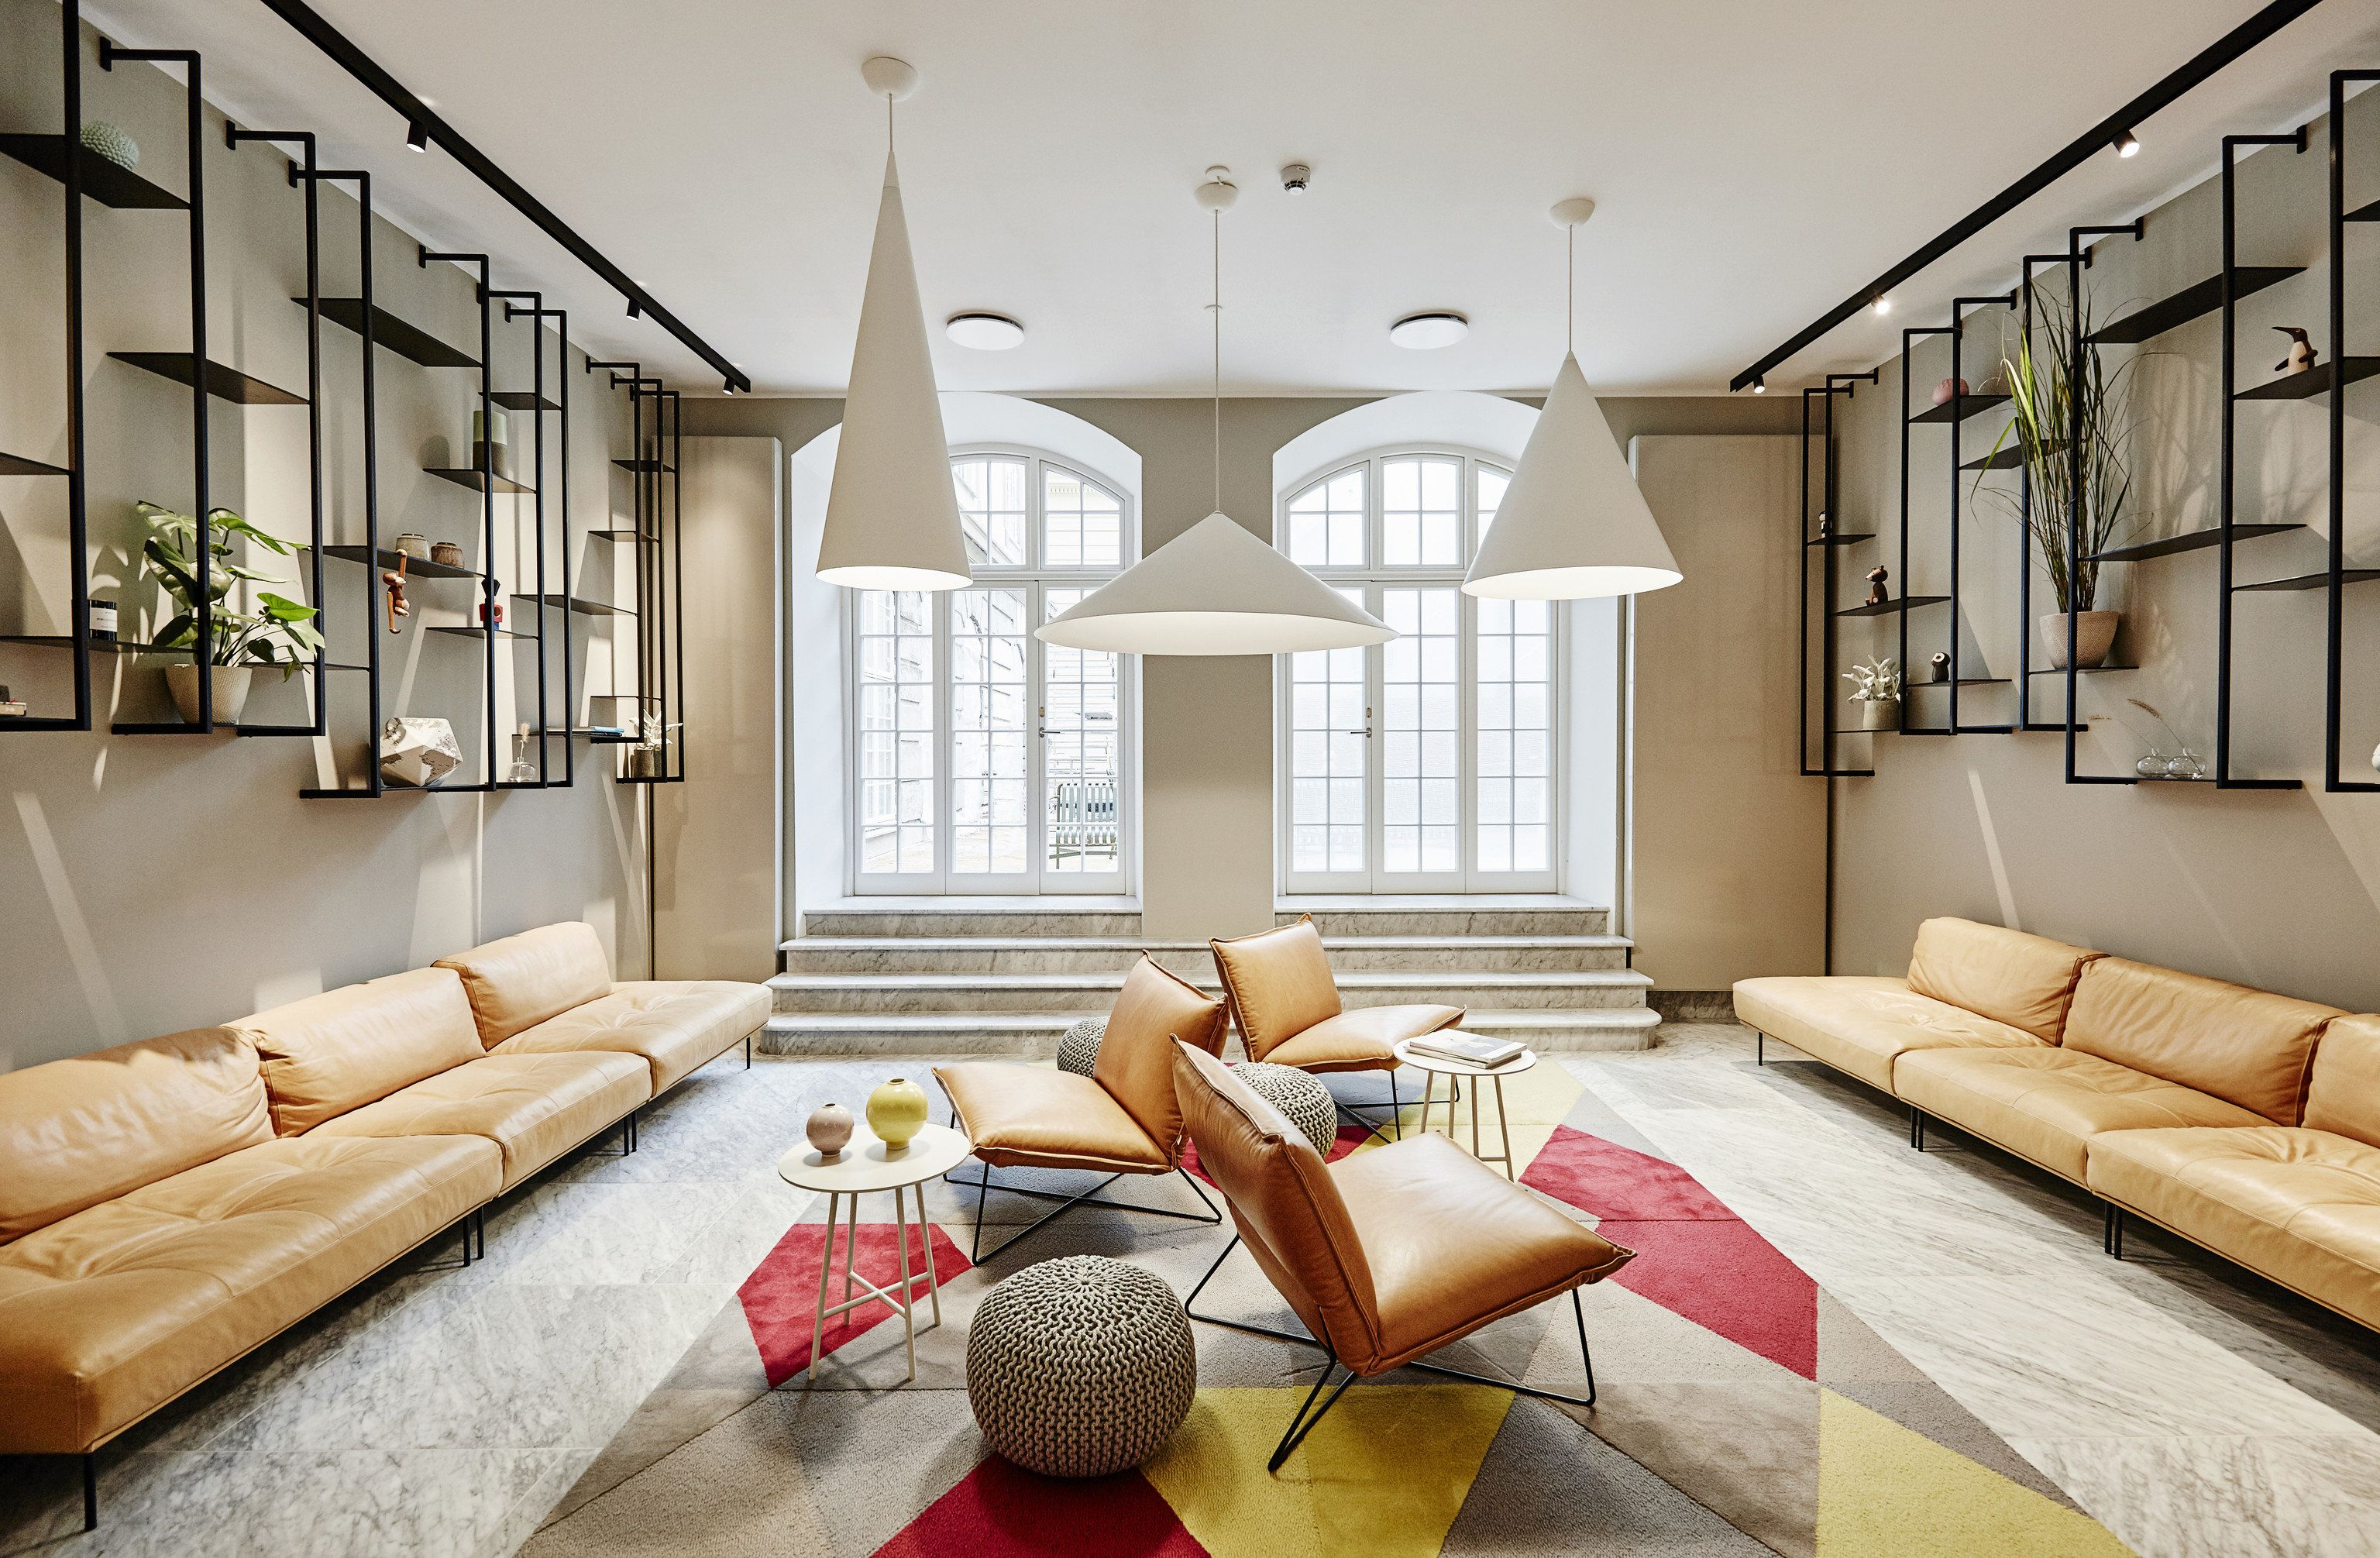 9 Scandinavian Design Hotels We Re Completely Obsessed With Jetsetter Copenhagen Hotel Hotels Design Scandinavian Hotel